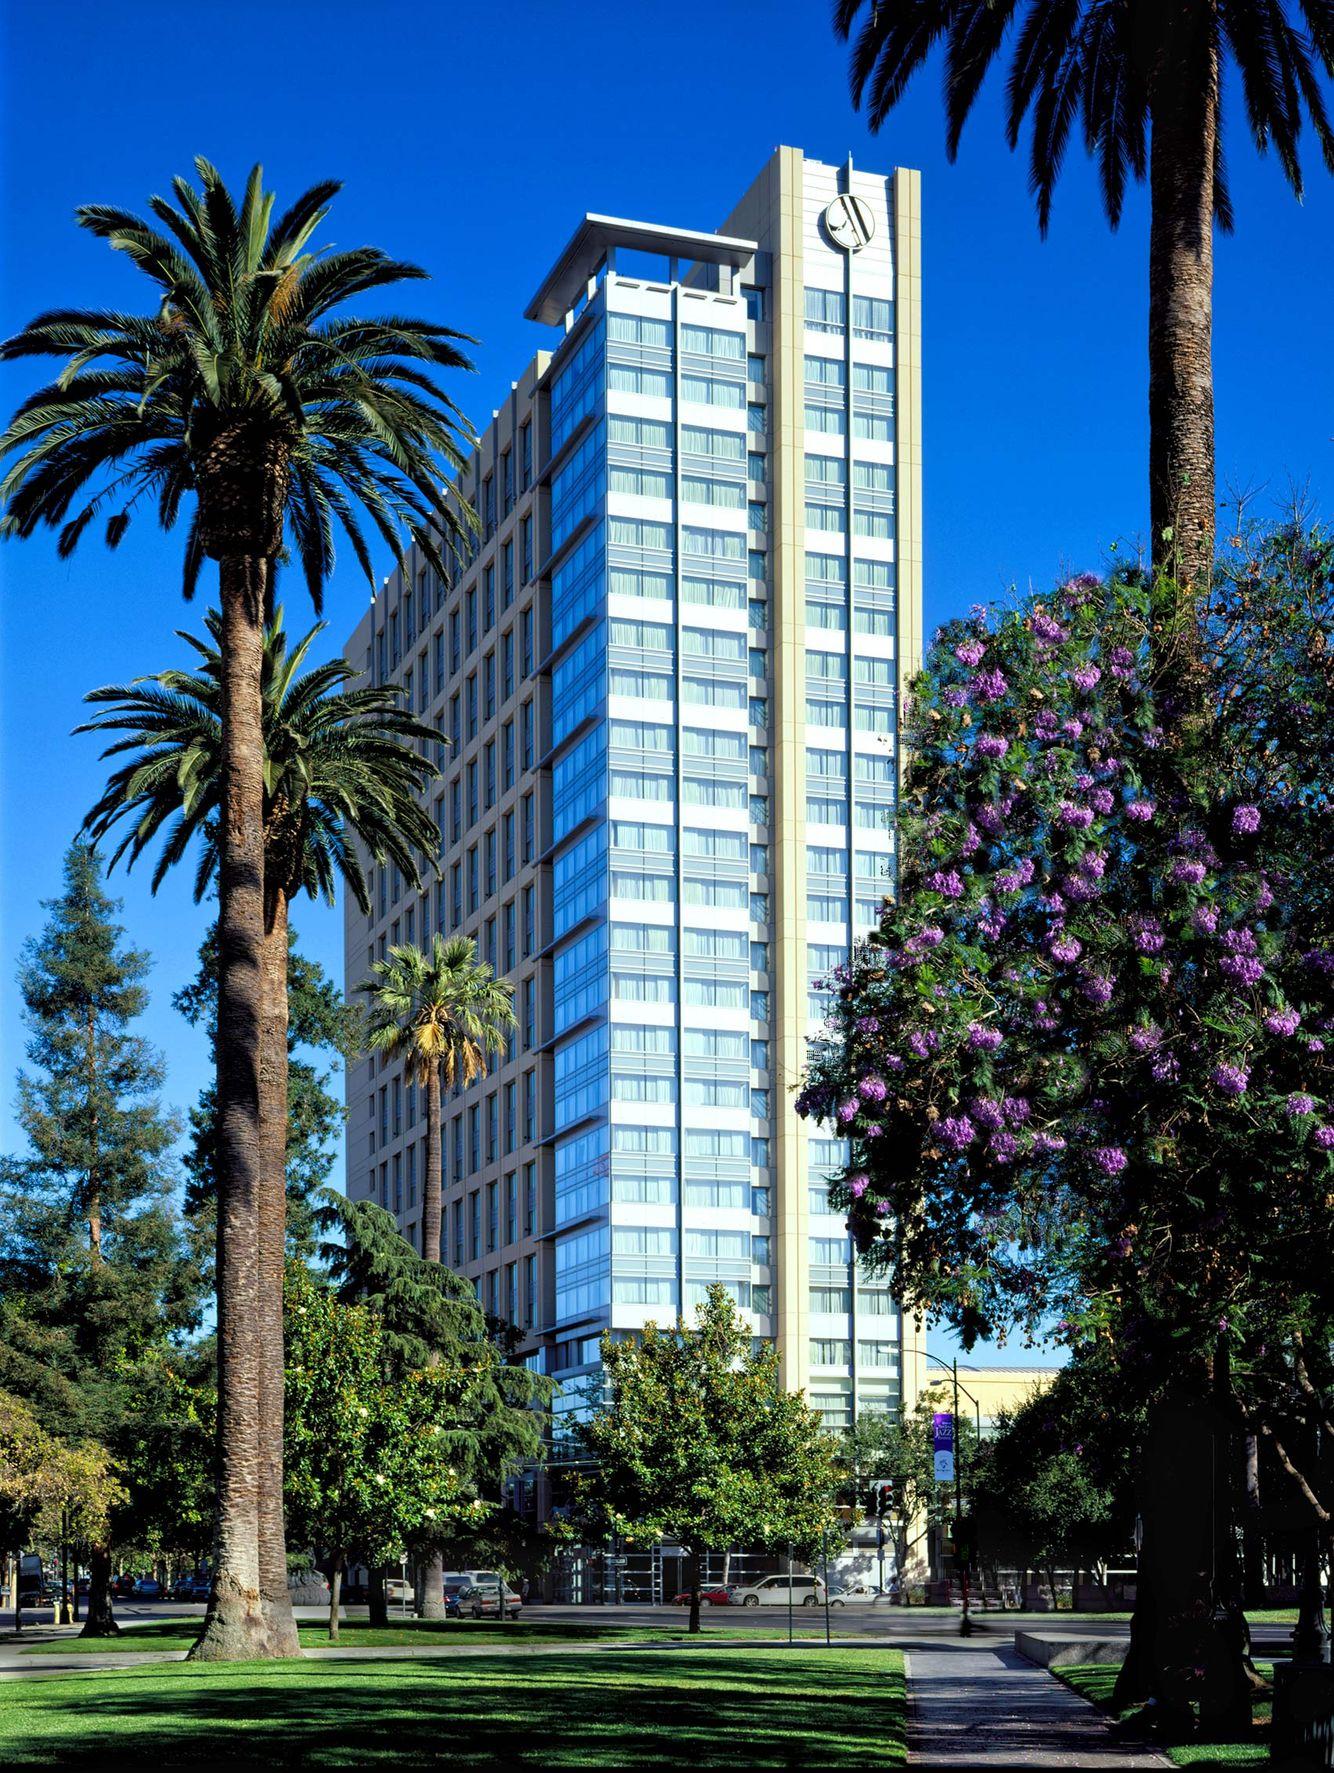 John-Sutton-Photography-Marriott San Jose Exterior